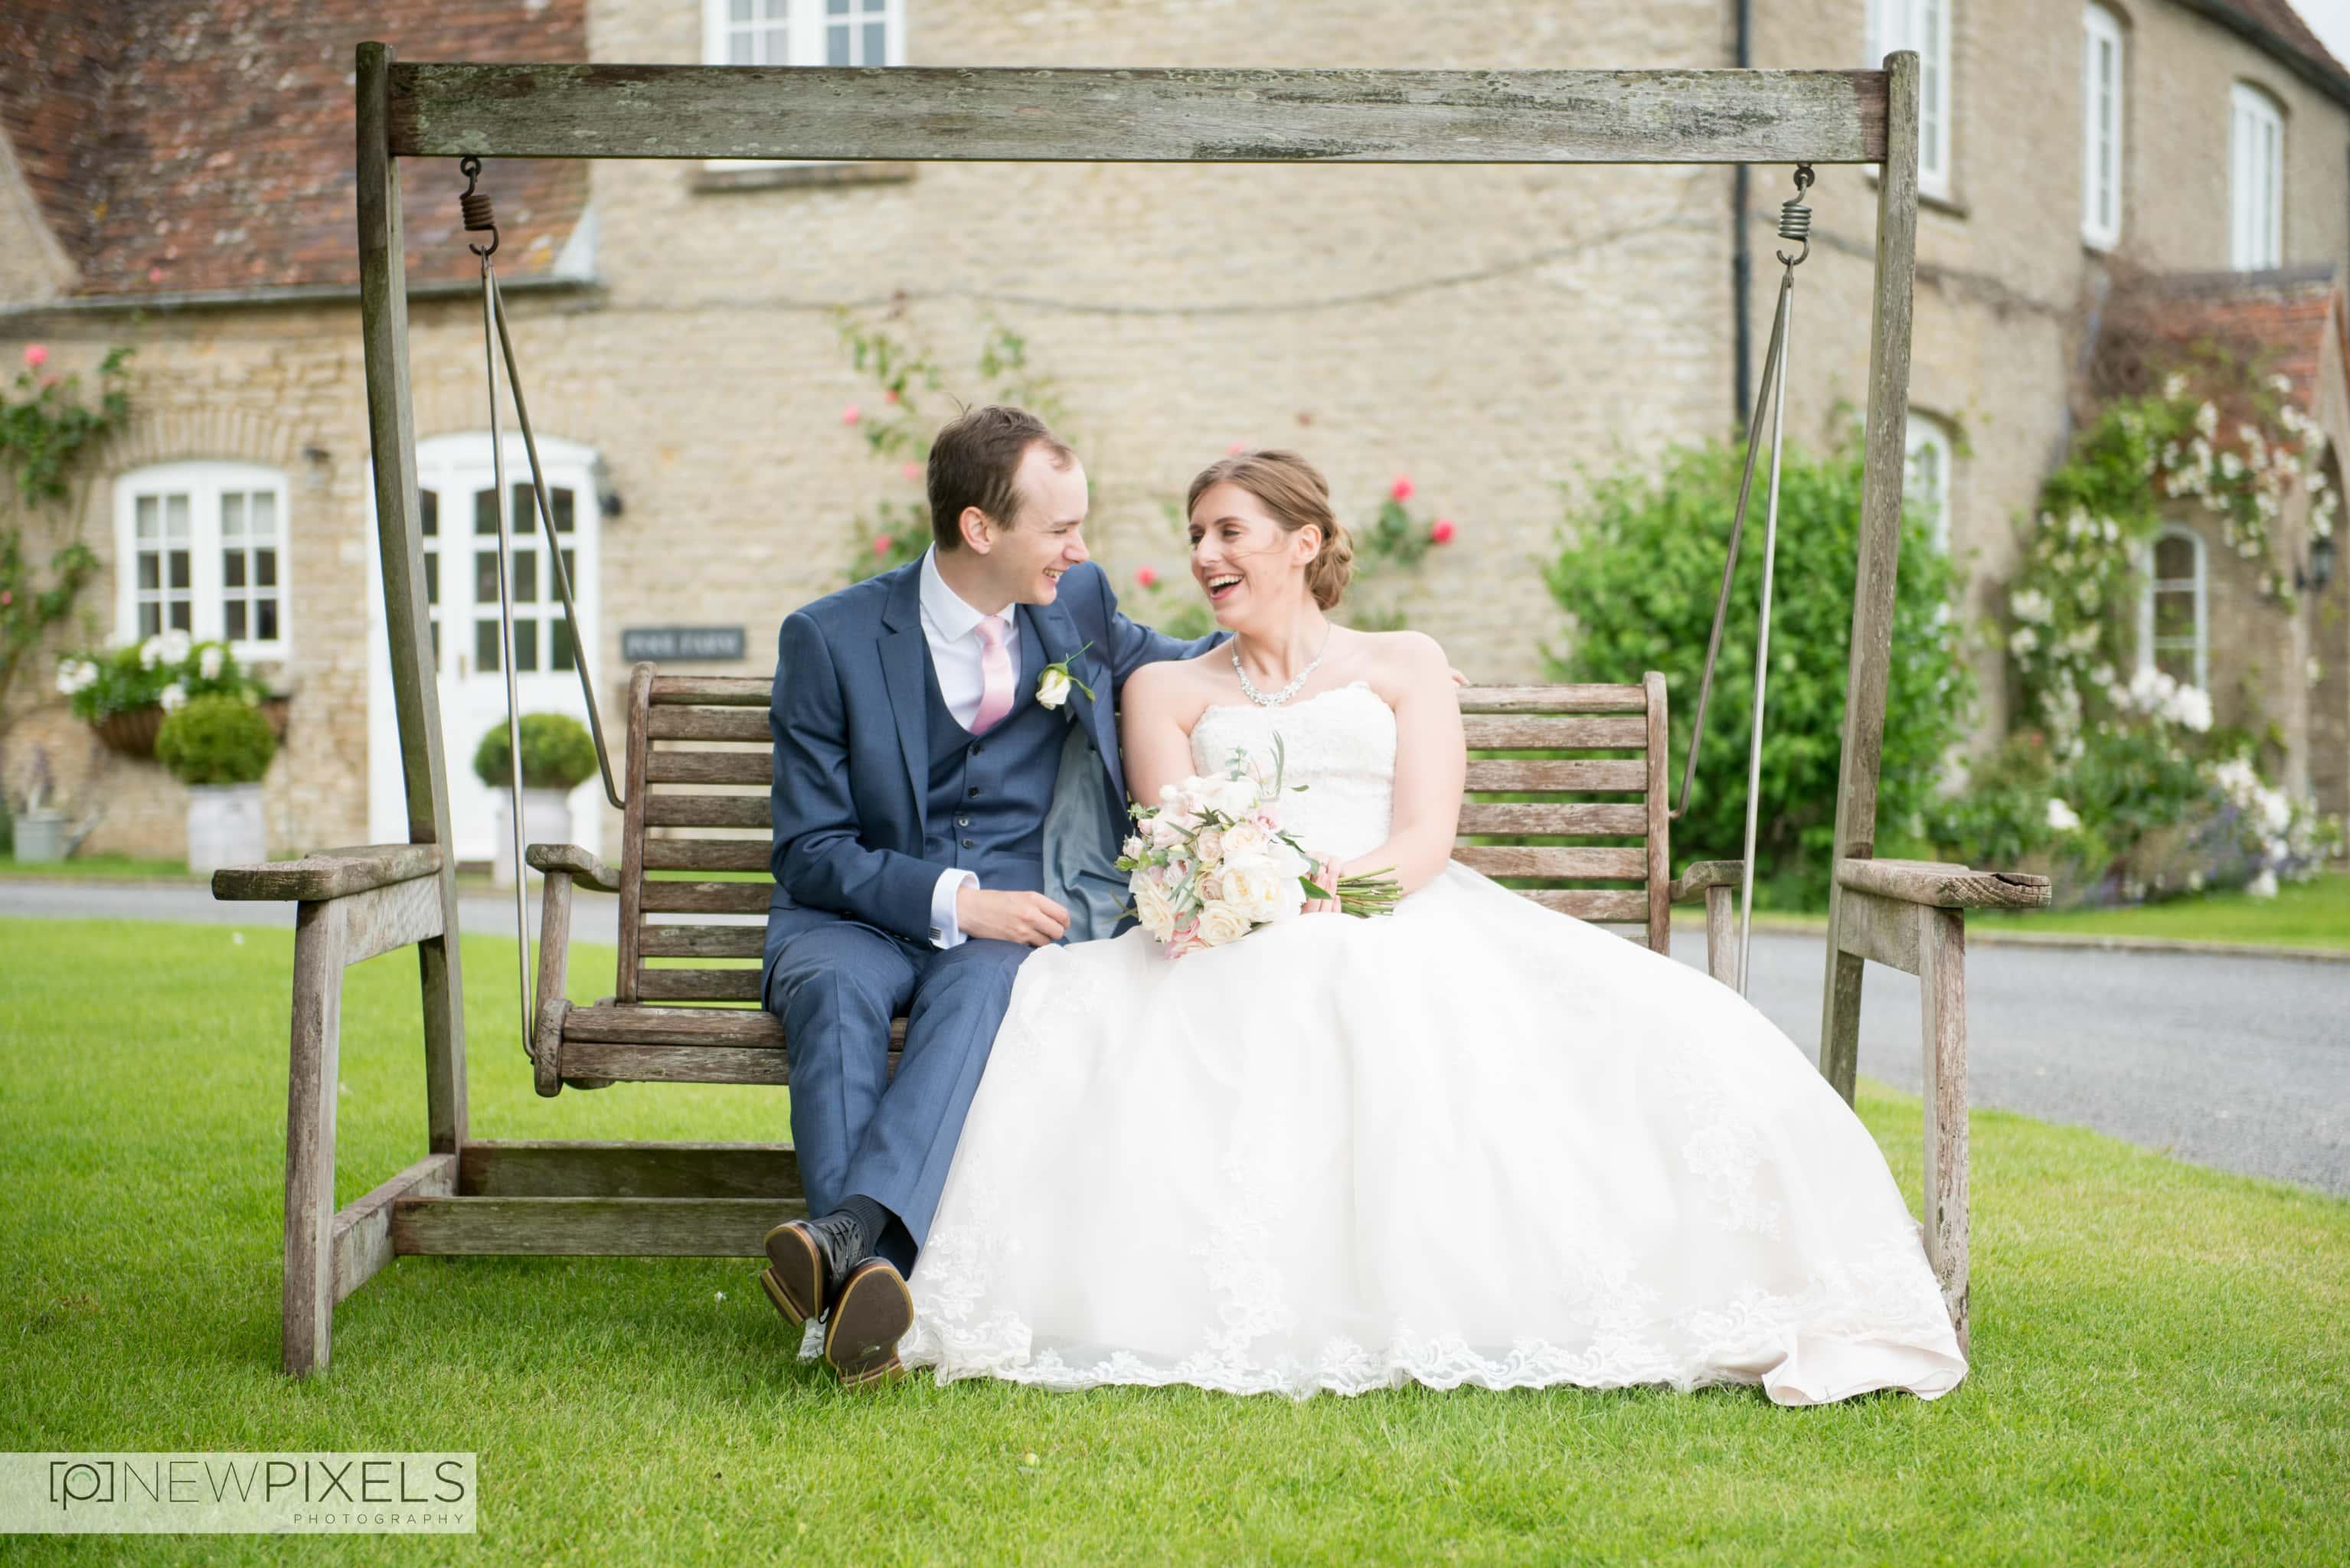 Hertfordshire Wedding Photography- New Pixels-39